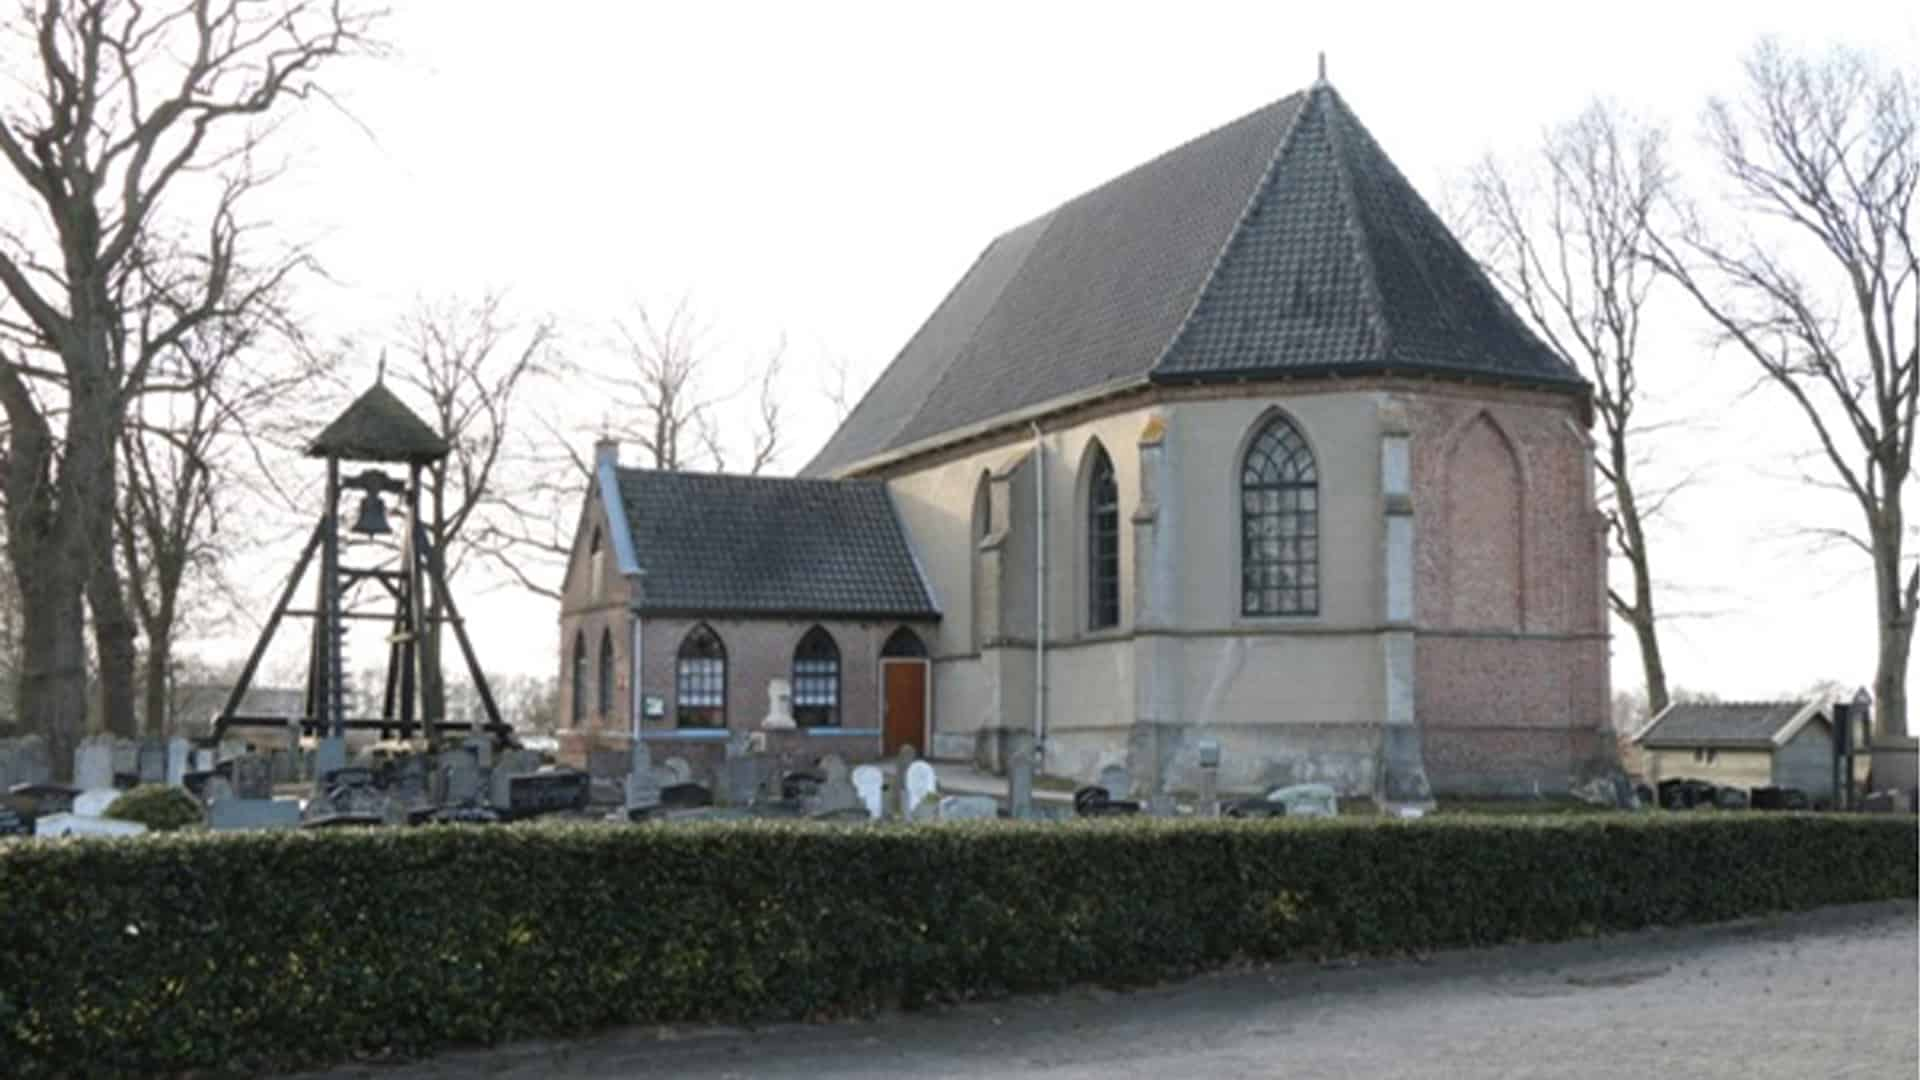 Kerk-Wanneperveen-21